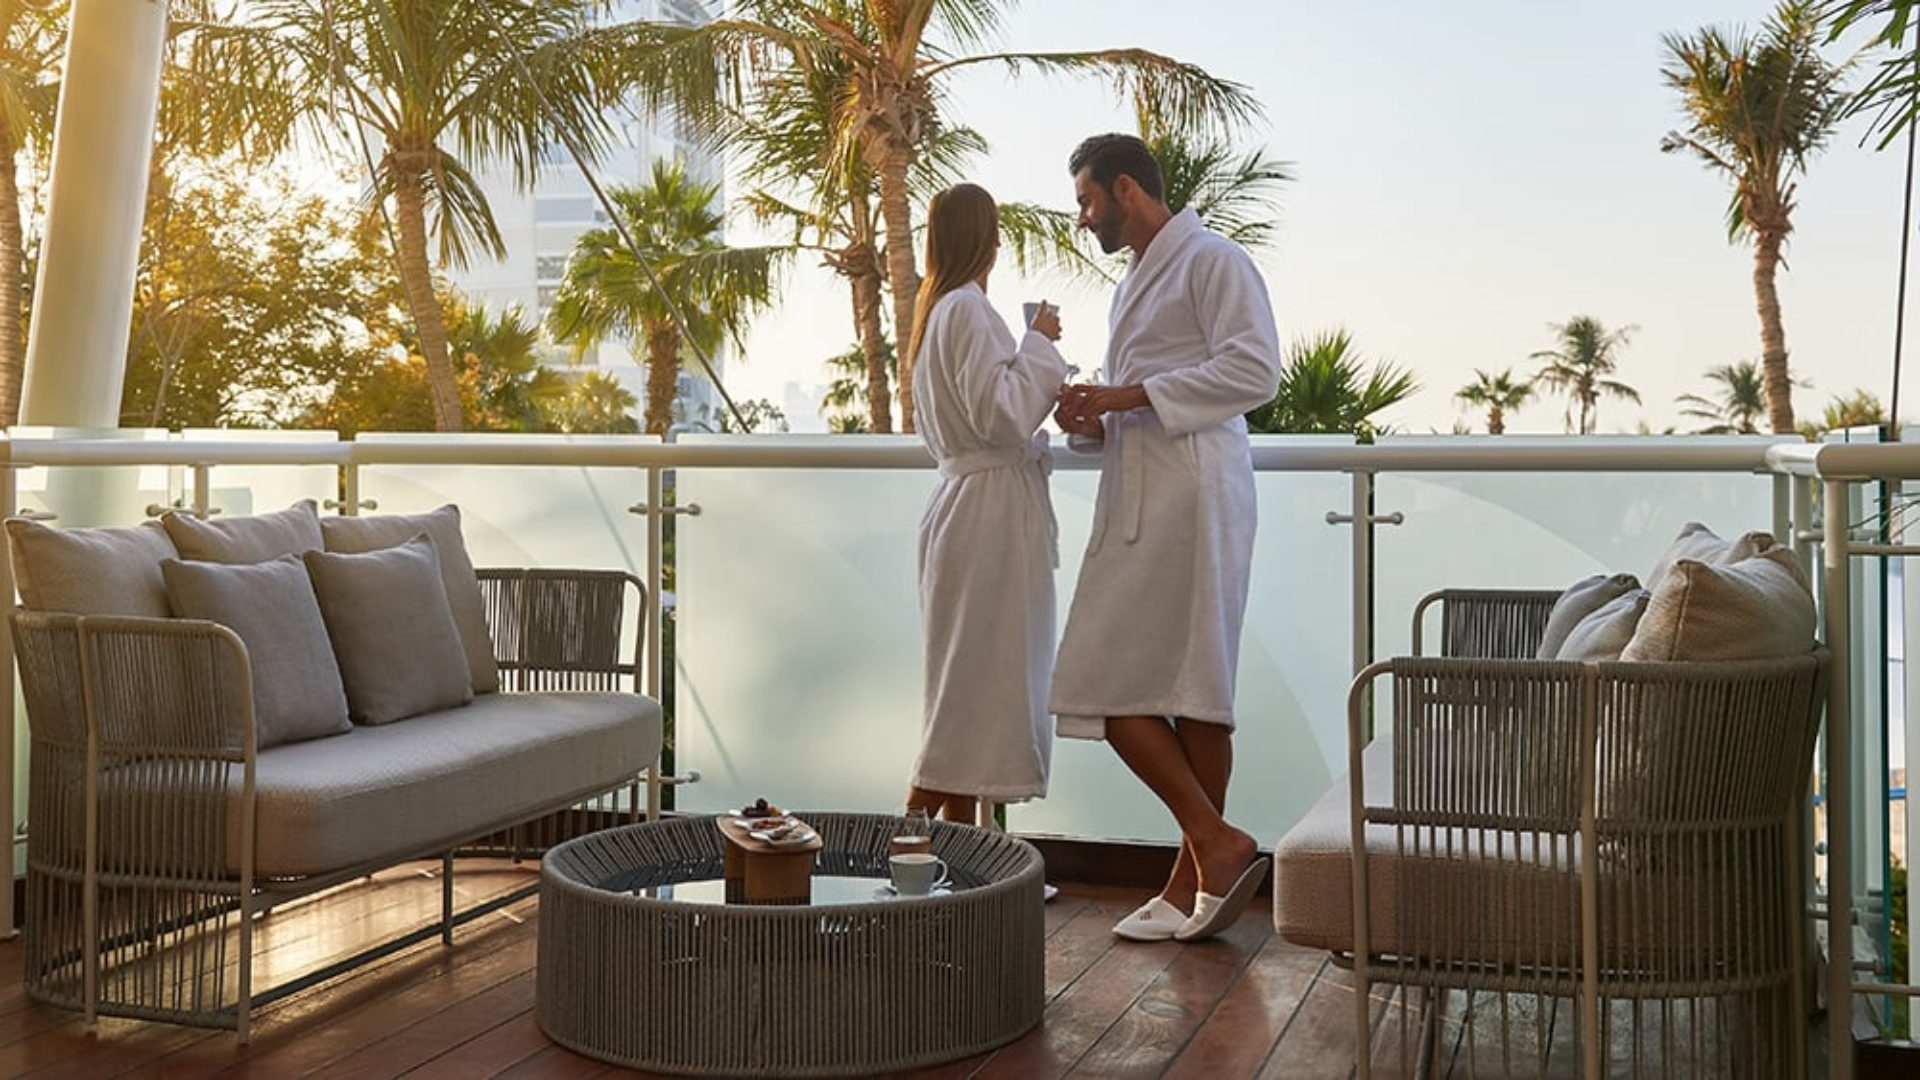 Couple on the balcony of Talise Spa at Jumeirah Beach Hotel